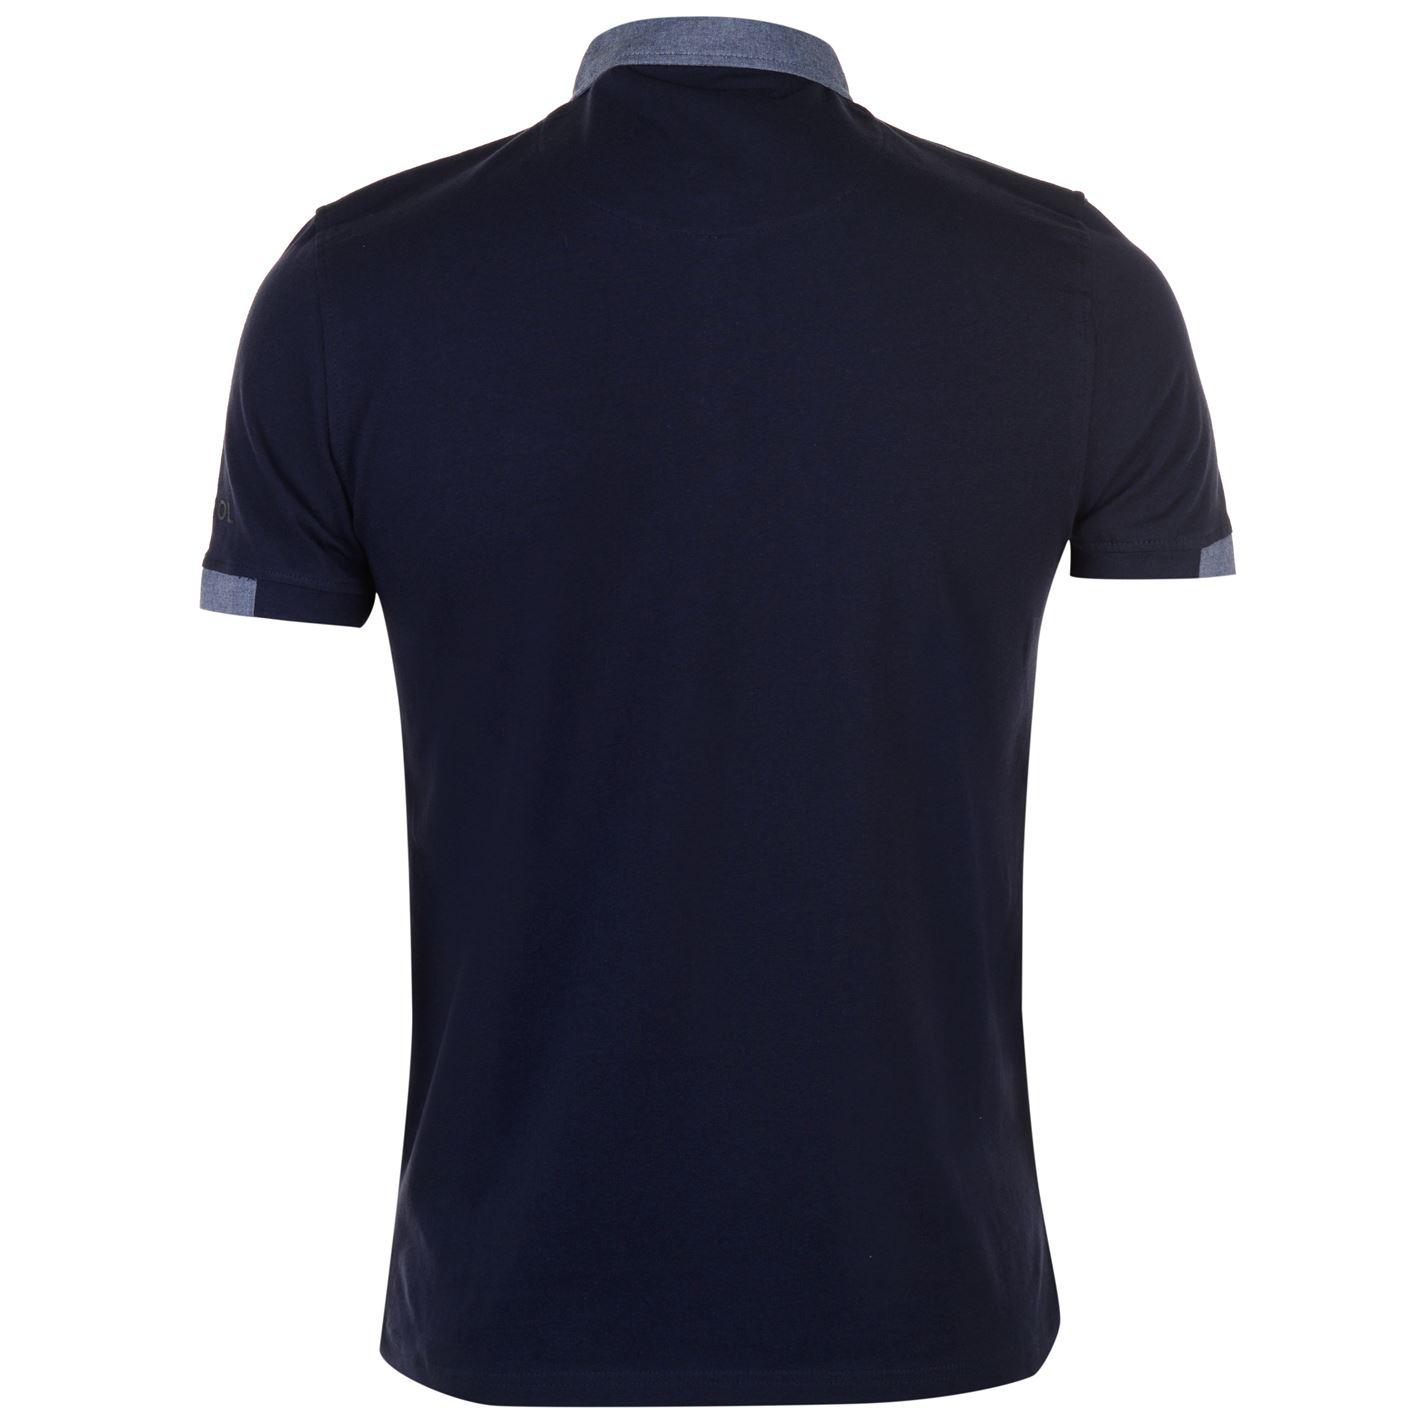 Kangol-Mens-Cham-Short-Sleeve-Polo-Shirt-Classic-Fit-Tee-Top-Lightweight-Colour thumbnail 9